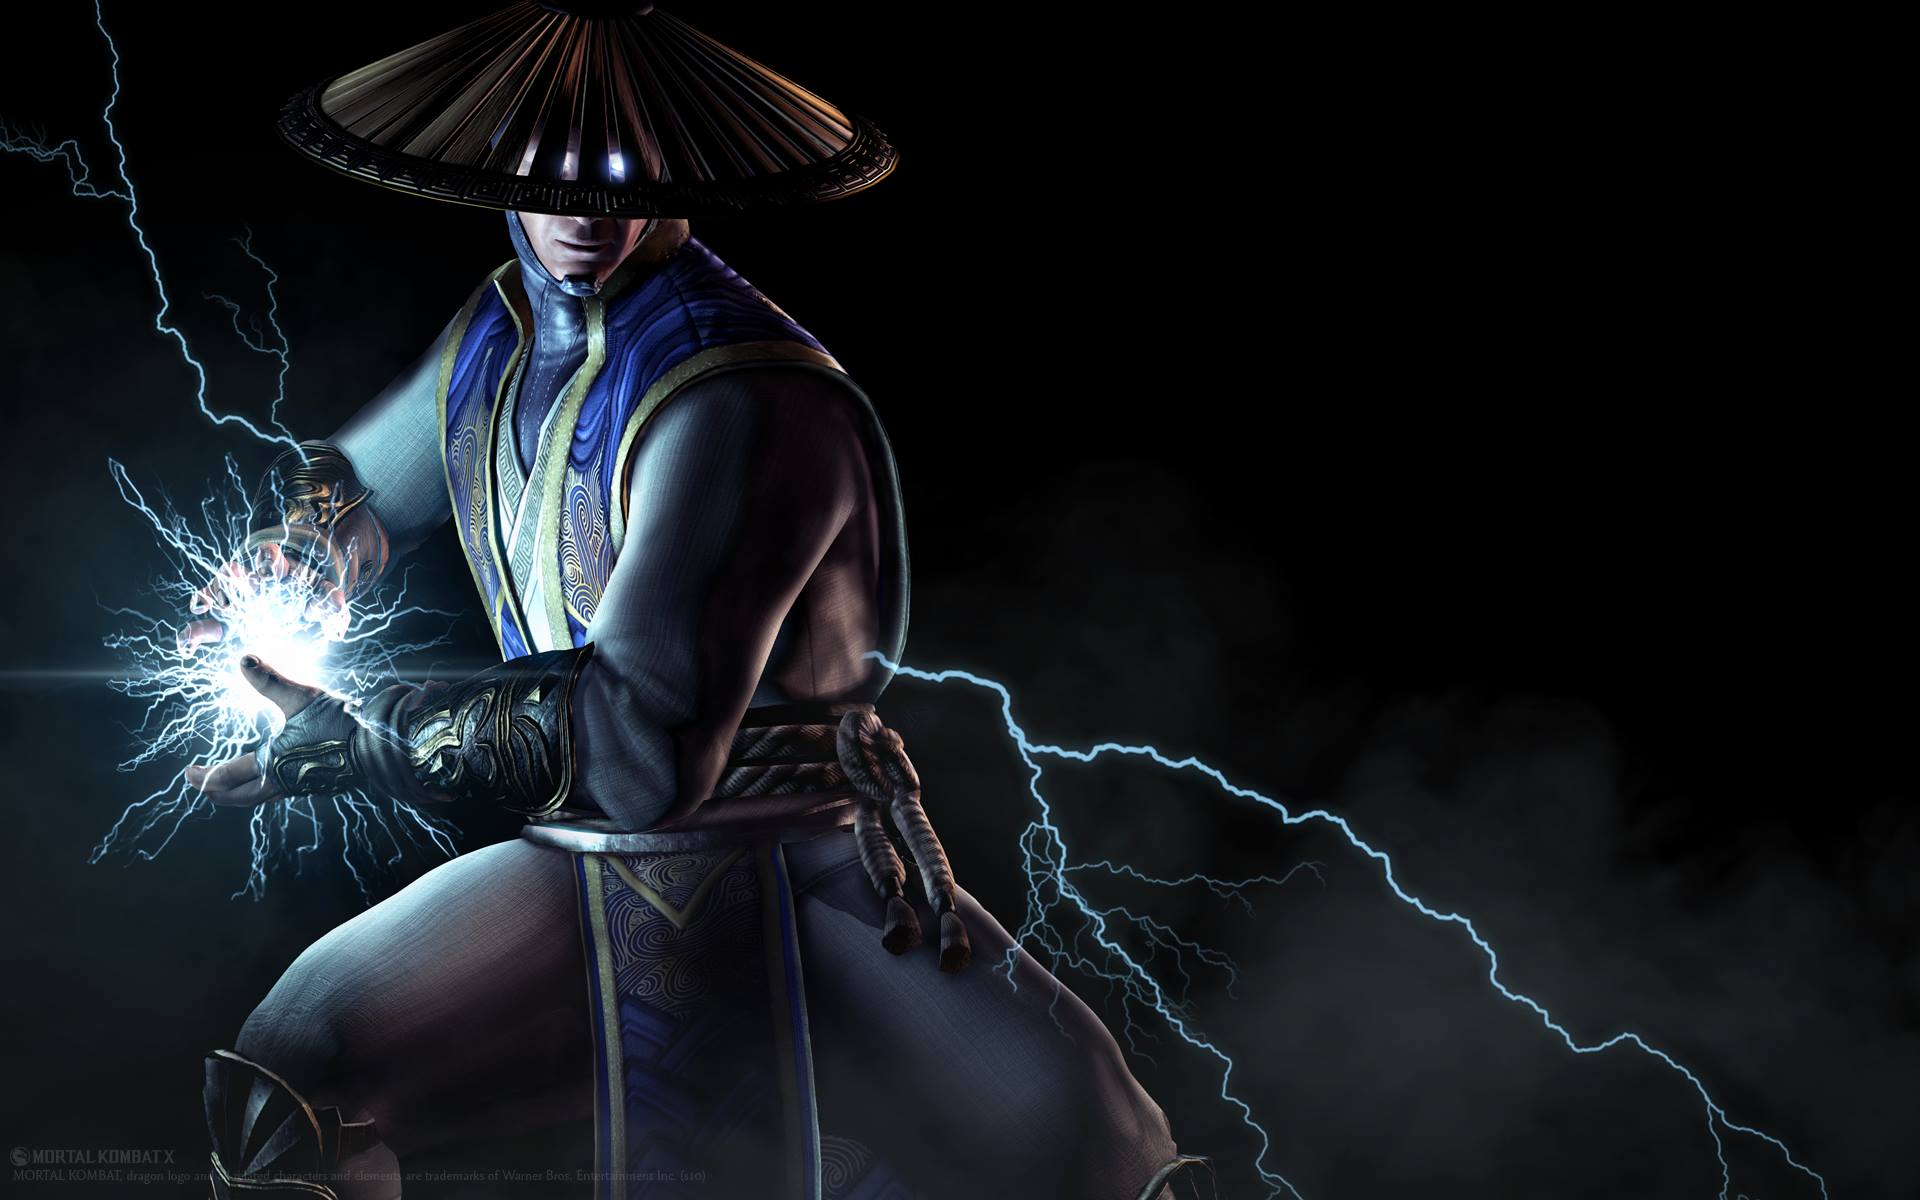 49 Raiden Mortal Kombat X Wallpaper On Wallpapersafari